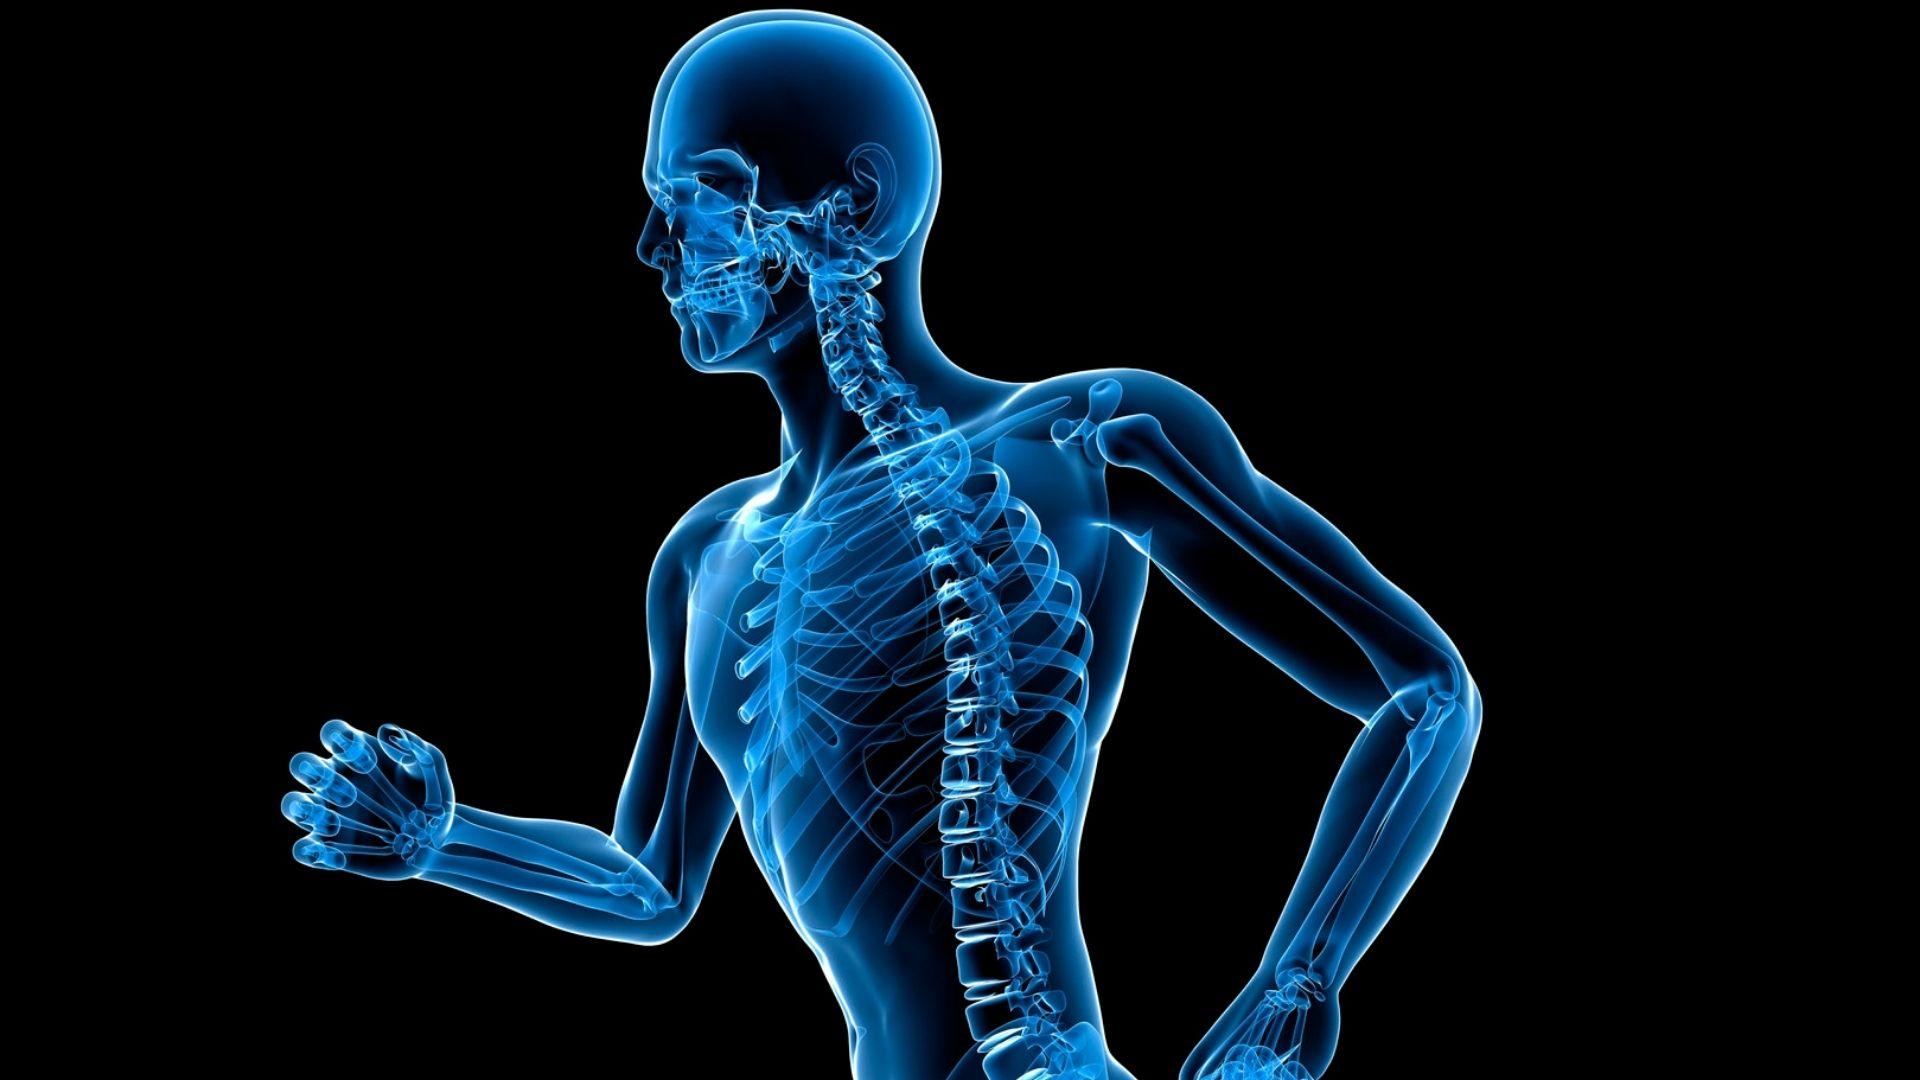 Episode 562 Do You Know - Bones and Skeleton